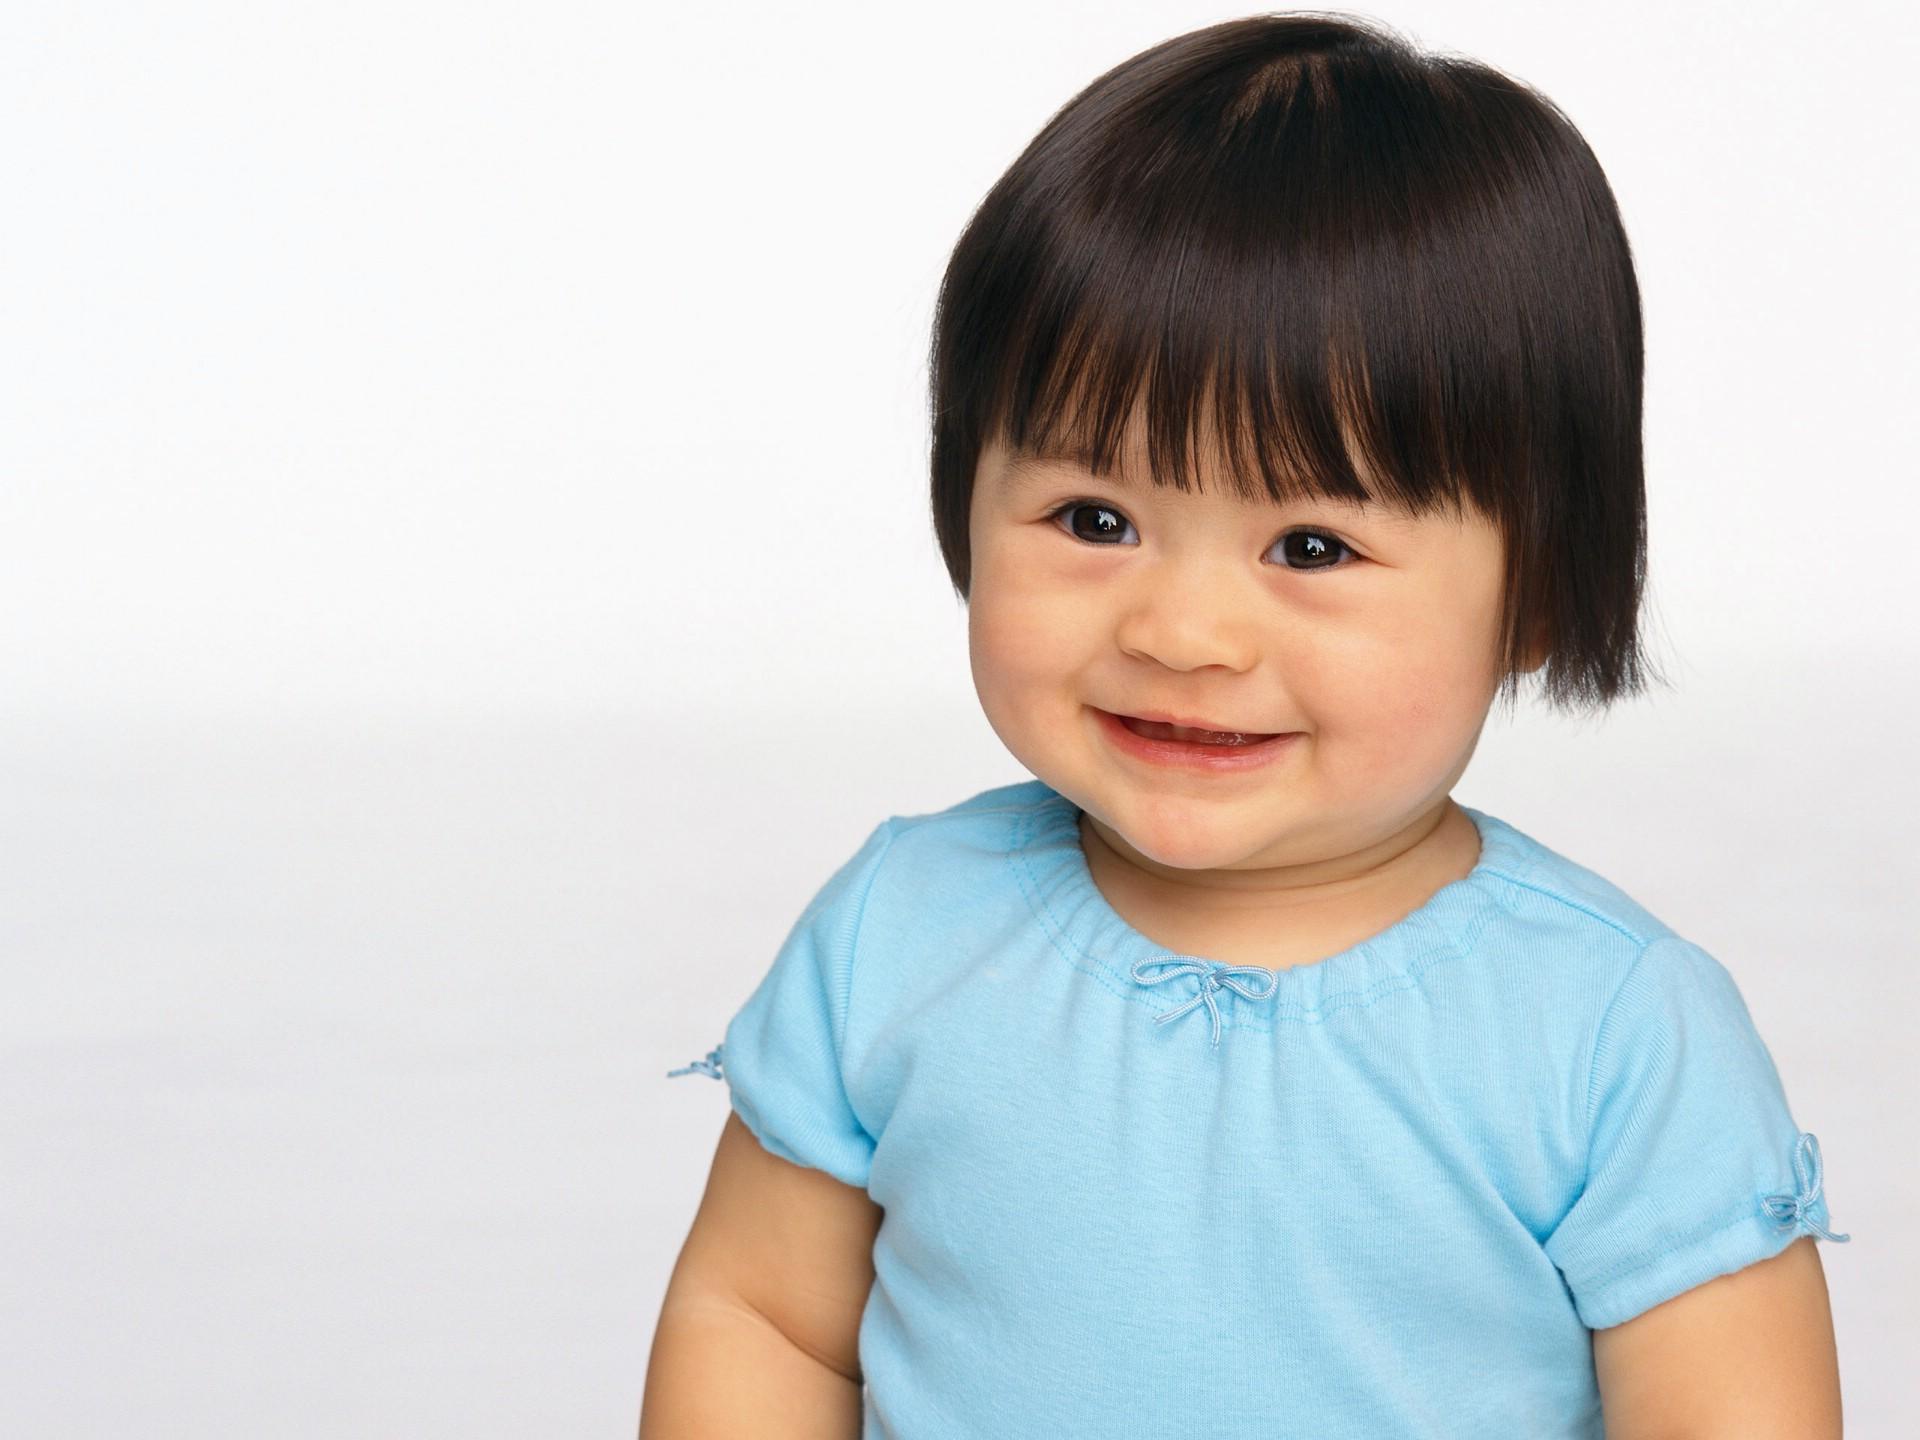 HD Wallpapers Cute Babies HD